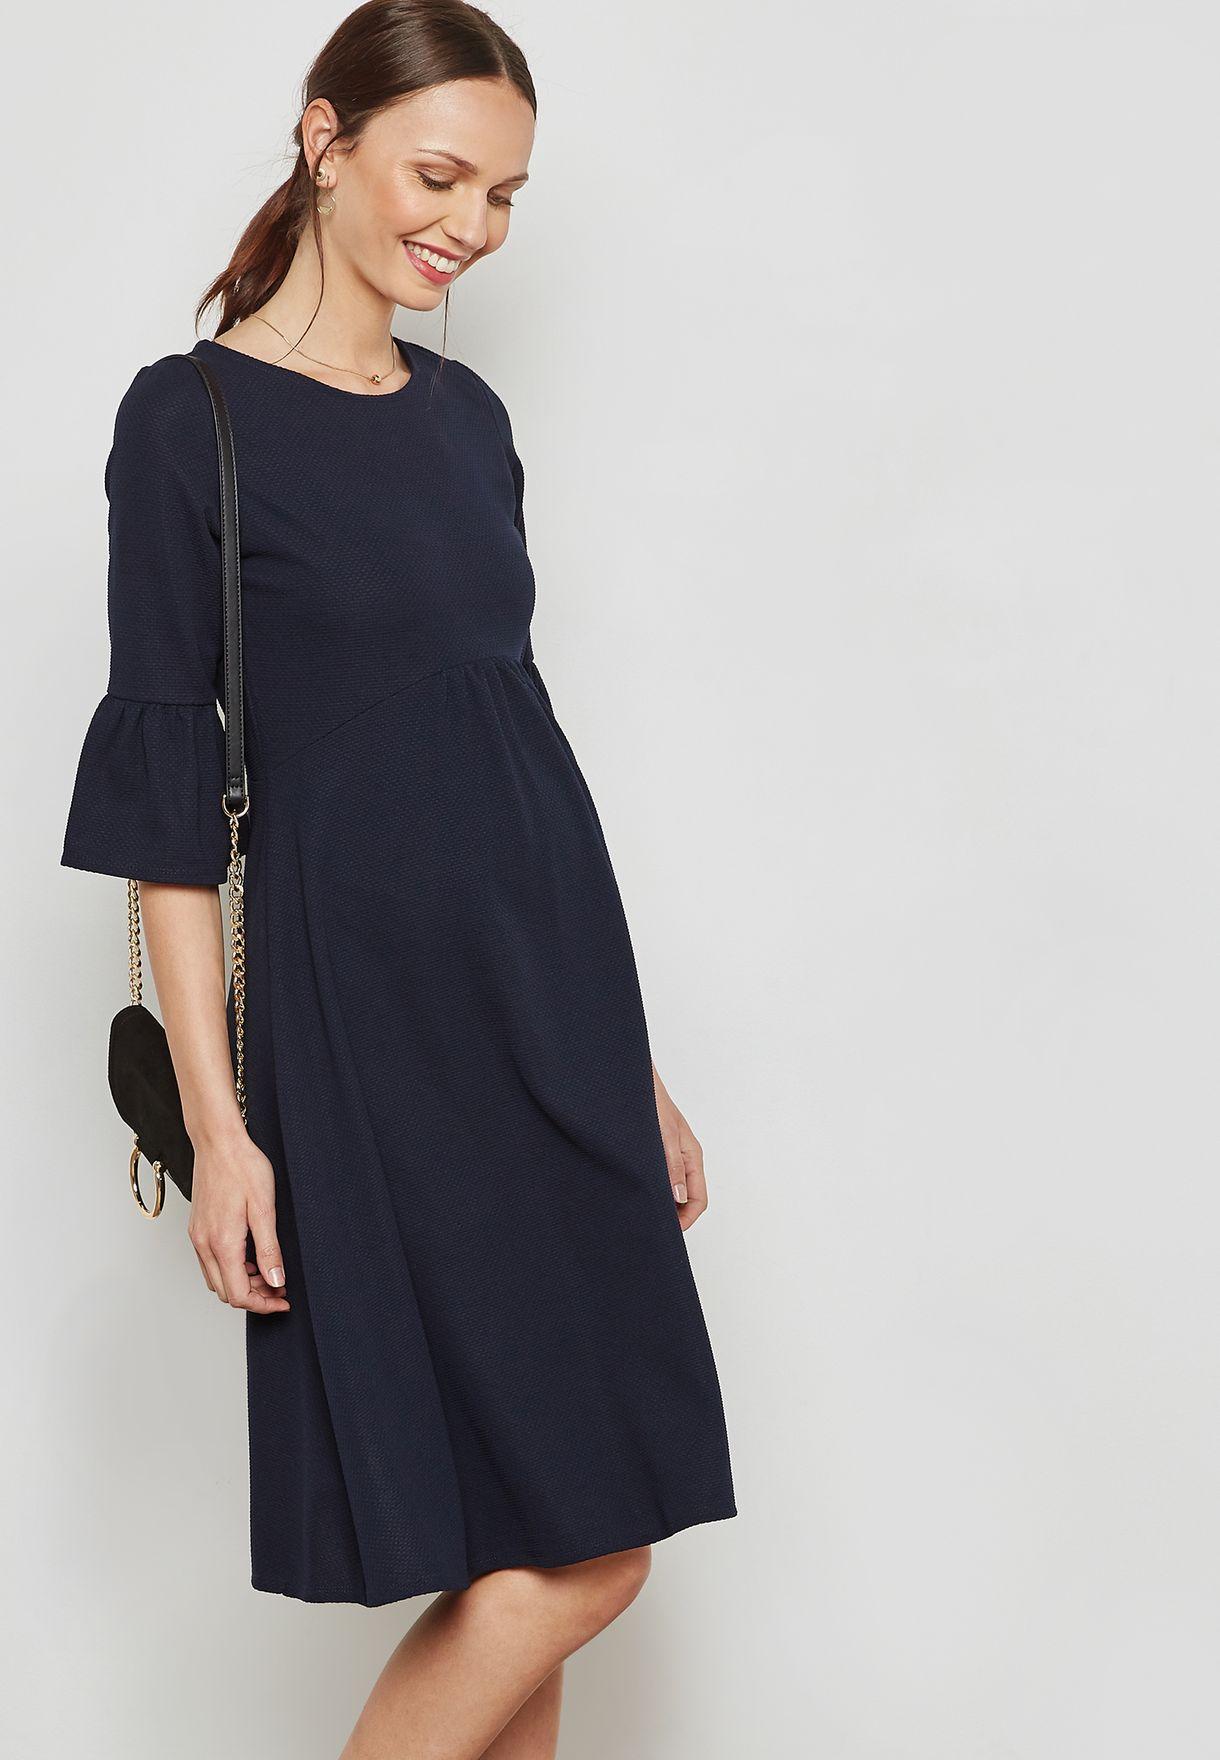 c2c8a23ed2ccd Shop Dorothy Perkins Maternity navy Flute Sleeve Skater Dress 17359330 for  Women in Qatar - DO104AT16KLR